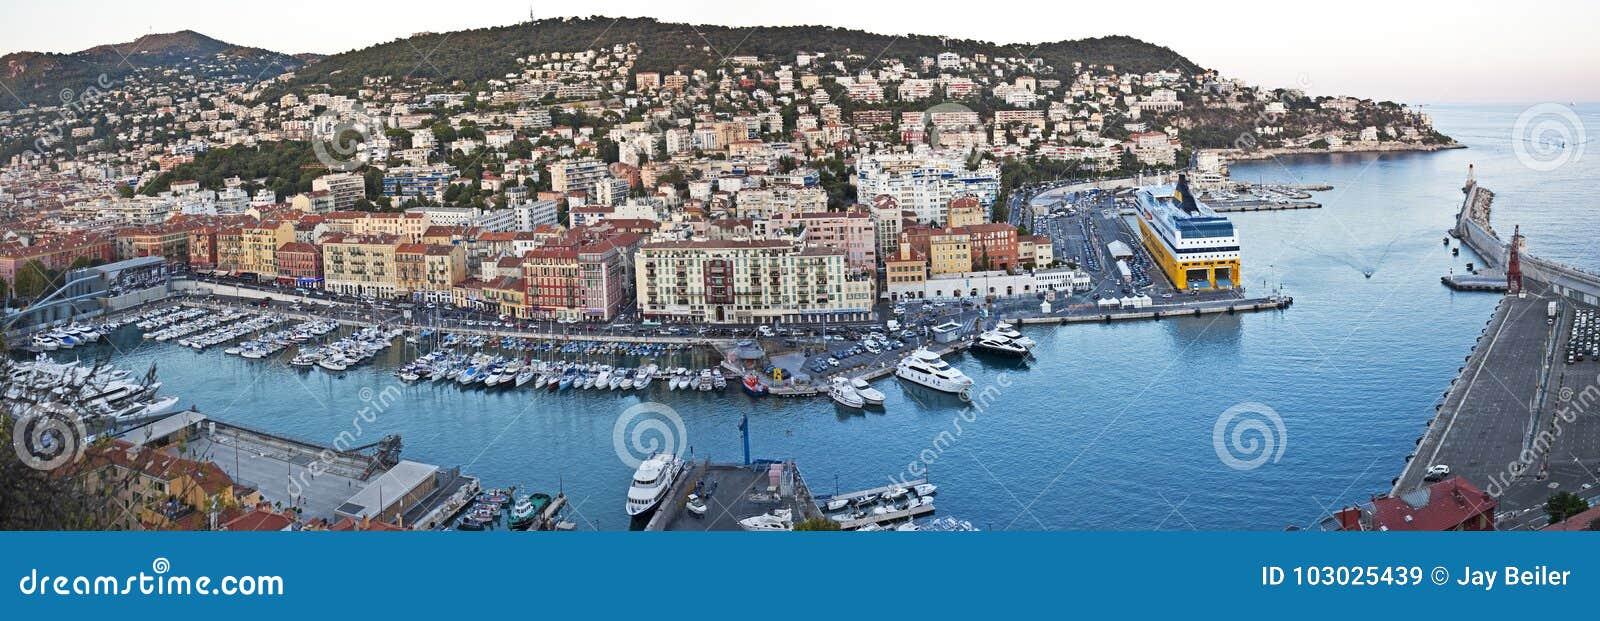 Panorama des Hafens Lympia, Nizza, Frankreich